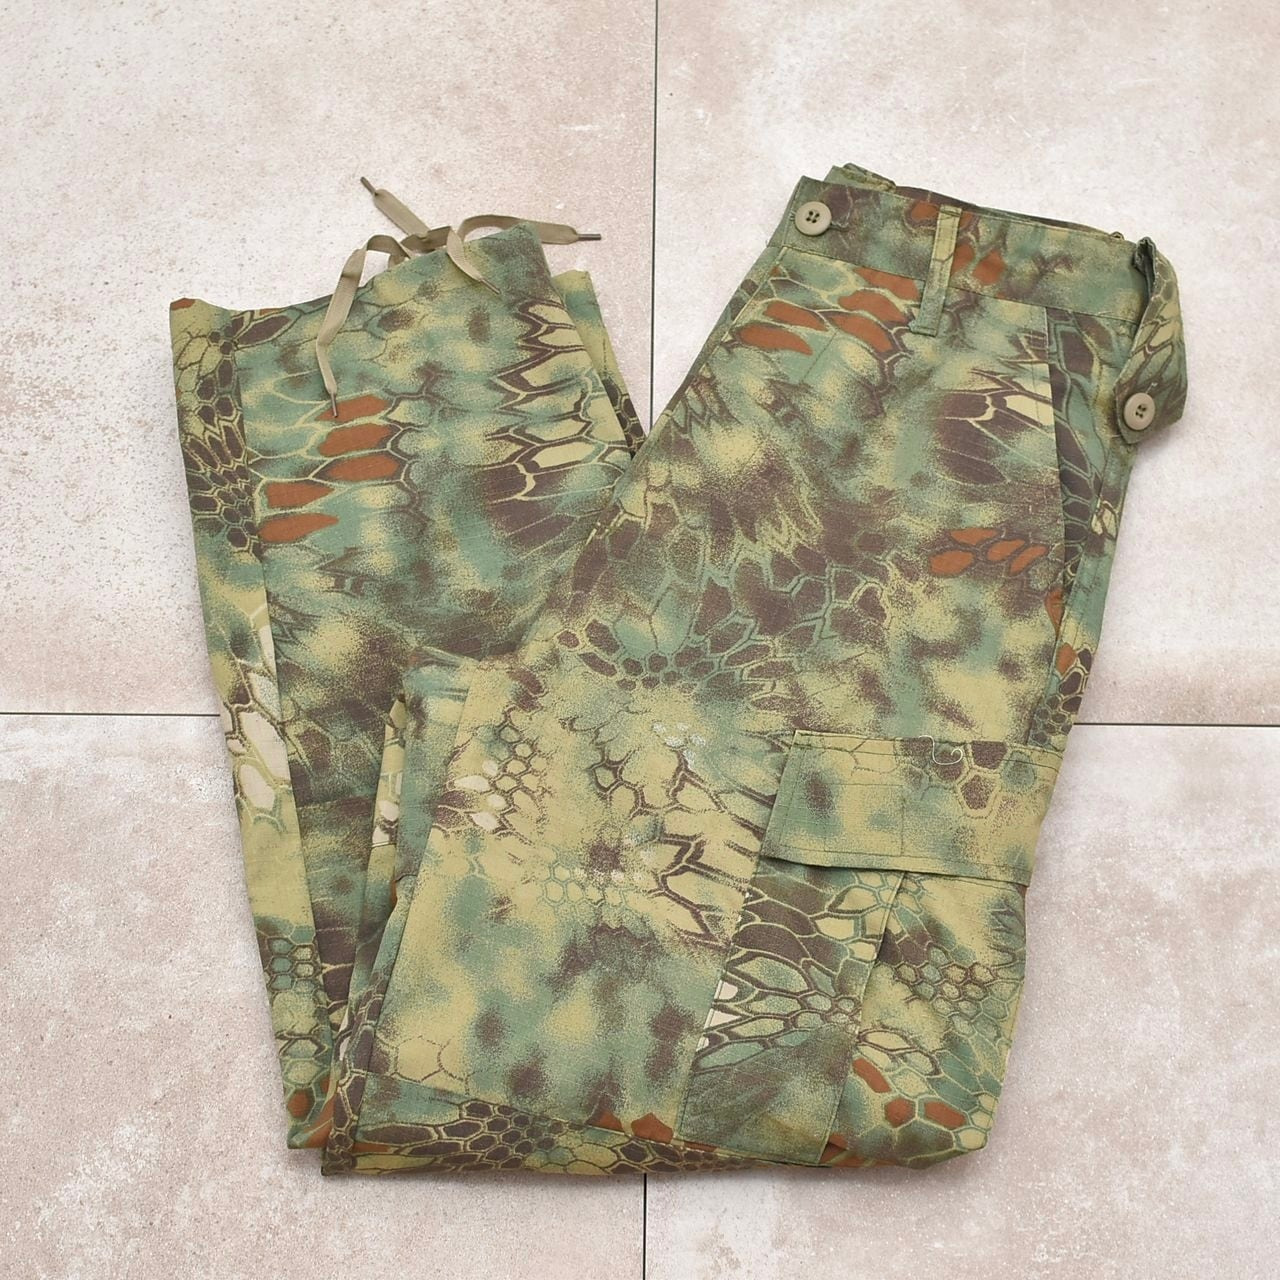 Geometric camouflage B.D.U. cargo pants